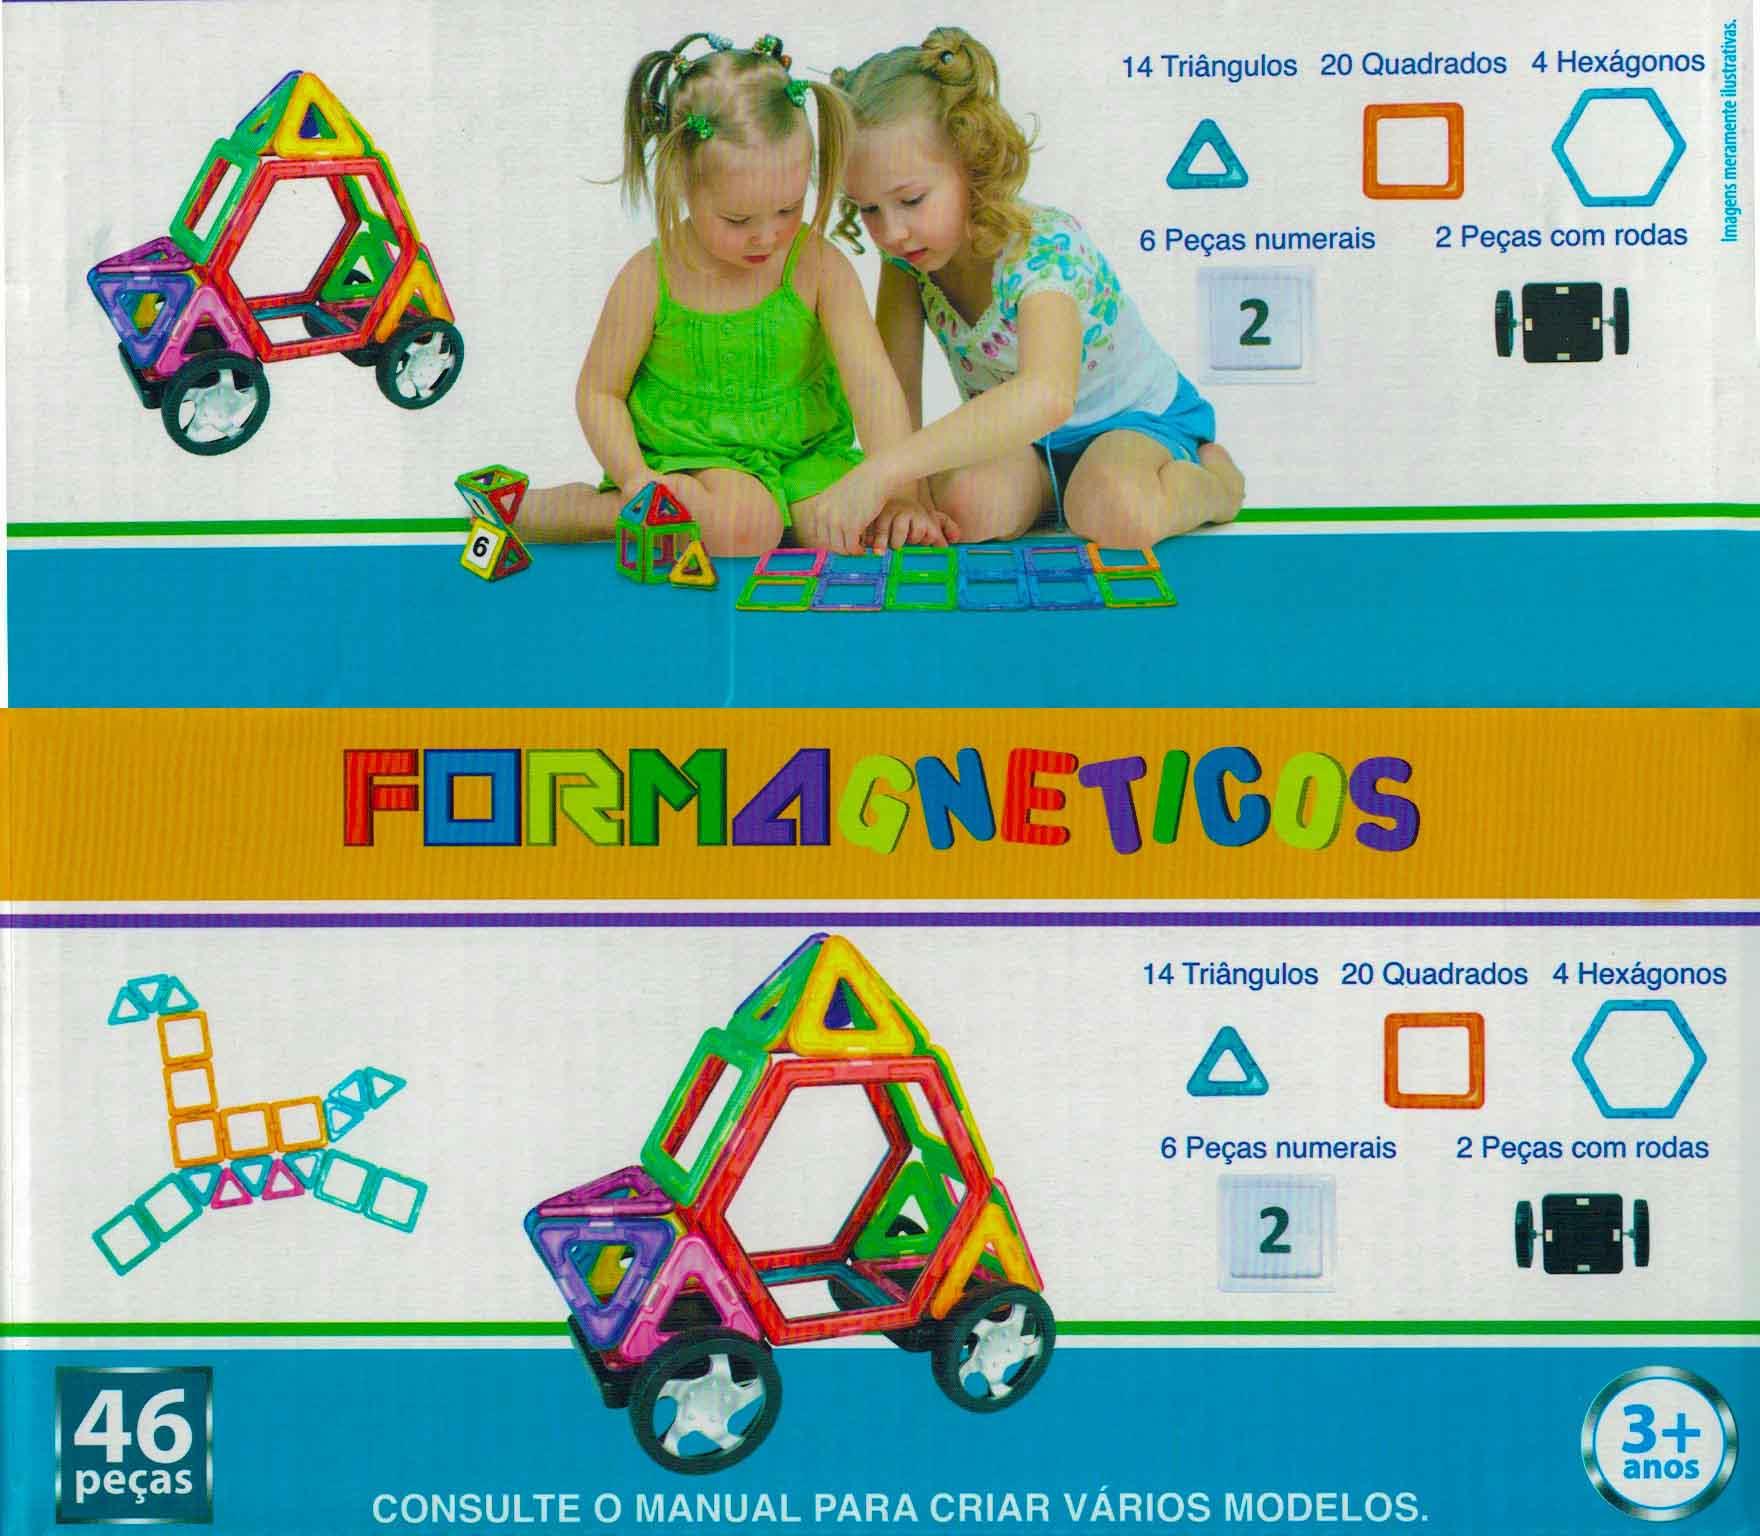 Formas Magnética, Blocos Magnético Brinquedo Educativo Com imãs de neodímio